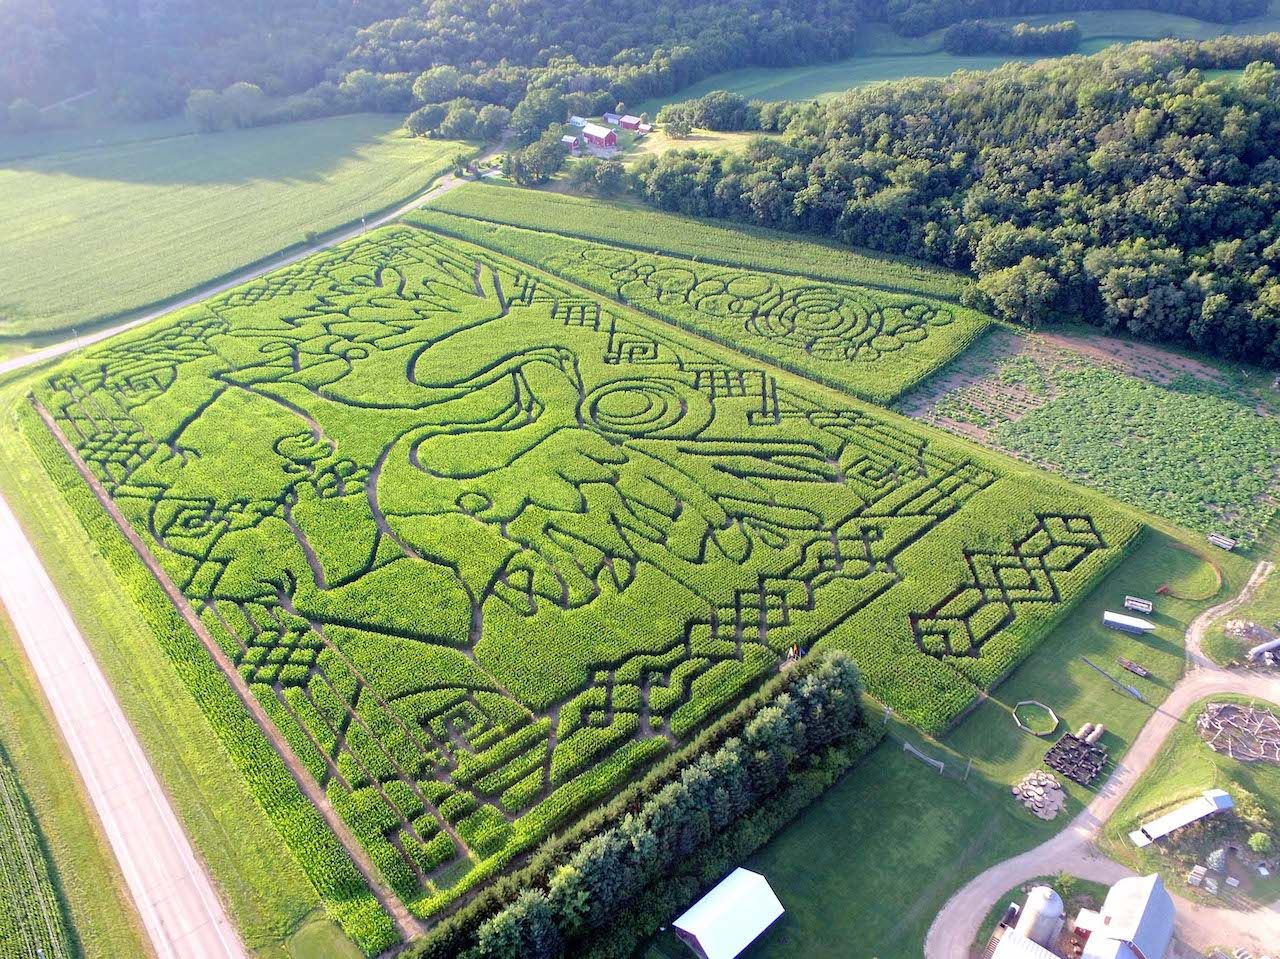 Treinen Farm Corn Maze and Pumpkin Patch in Lodi, Wisconsin